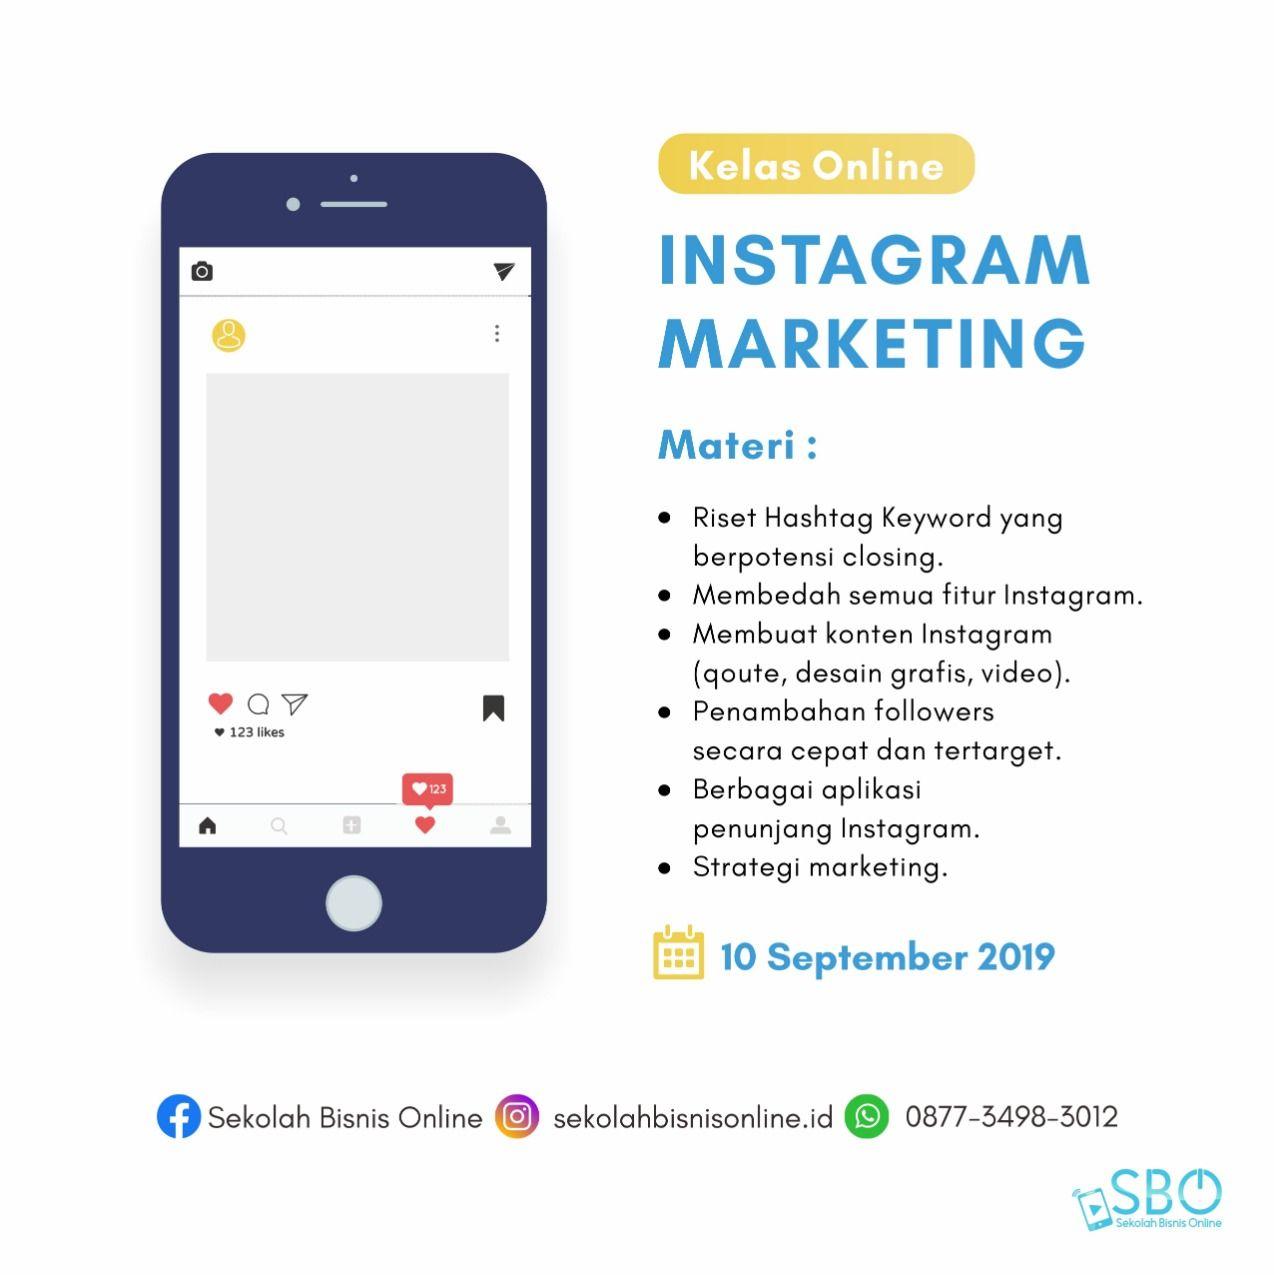 Belajar Instagram Marketing Strategi Marketing Bisnis Online Bisnis Rumahan Marketing Strategy Social Media Digital Marketing Strategy Instagram Marketing